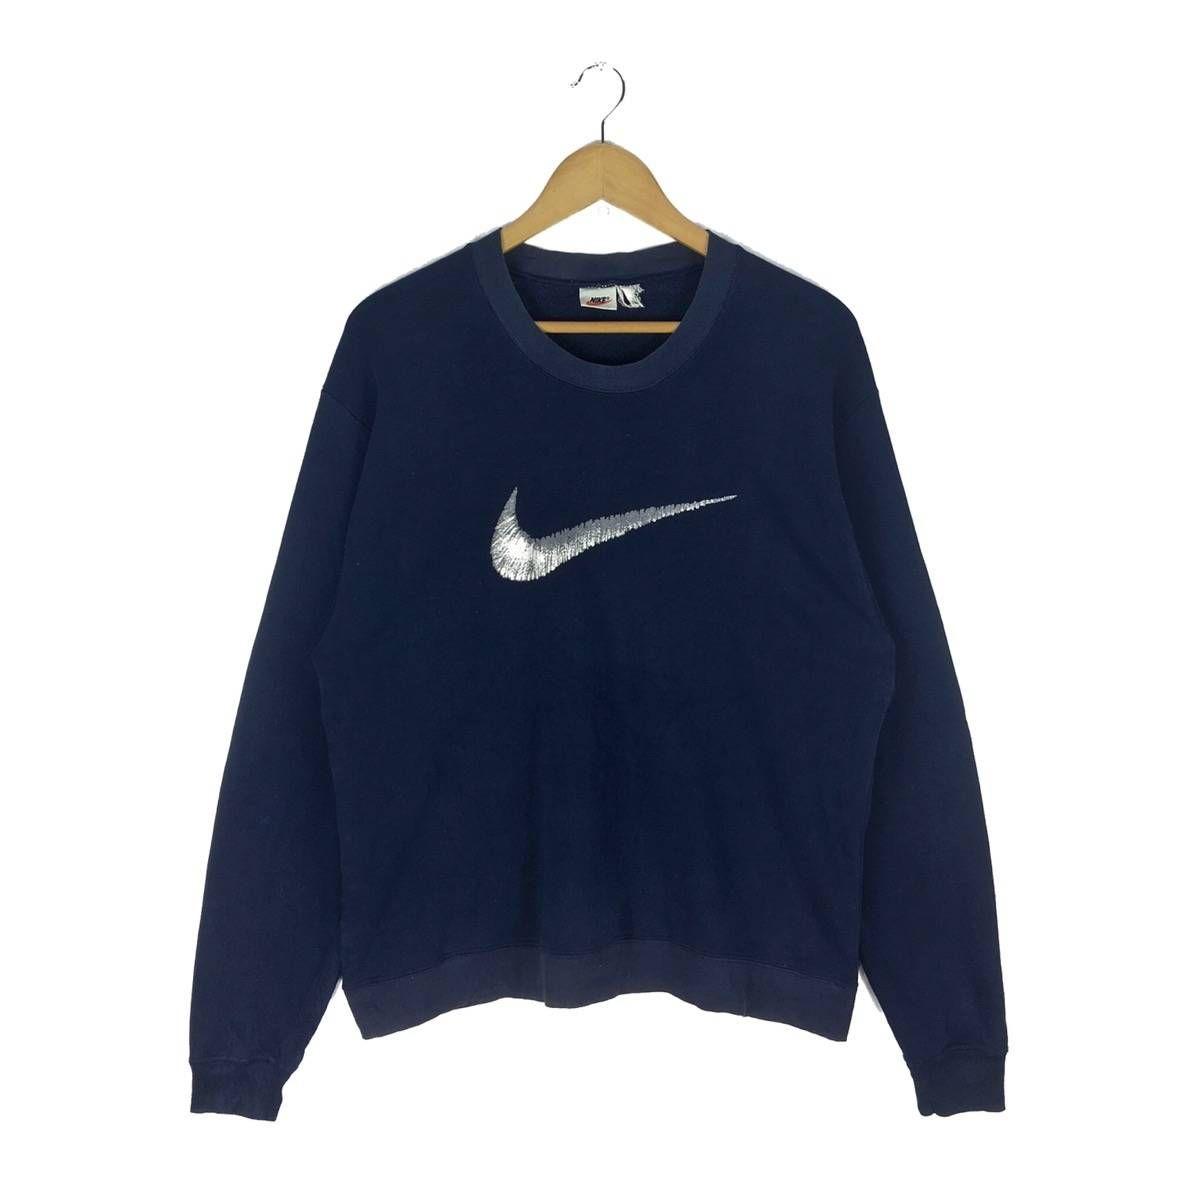 Nike Vintage Vintage Nike Big Logo Sweatshirt Crewneck Swoosh Size M 67 Vintage Nike Sweatshirts Nike Tops